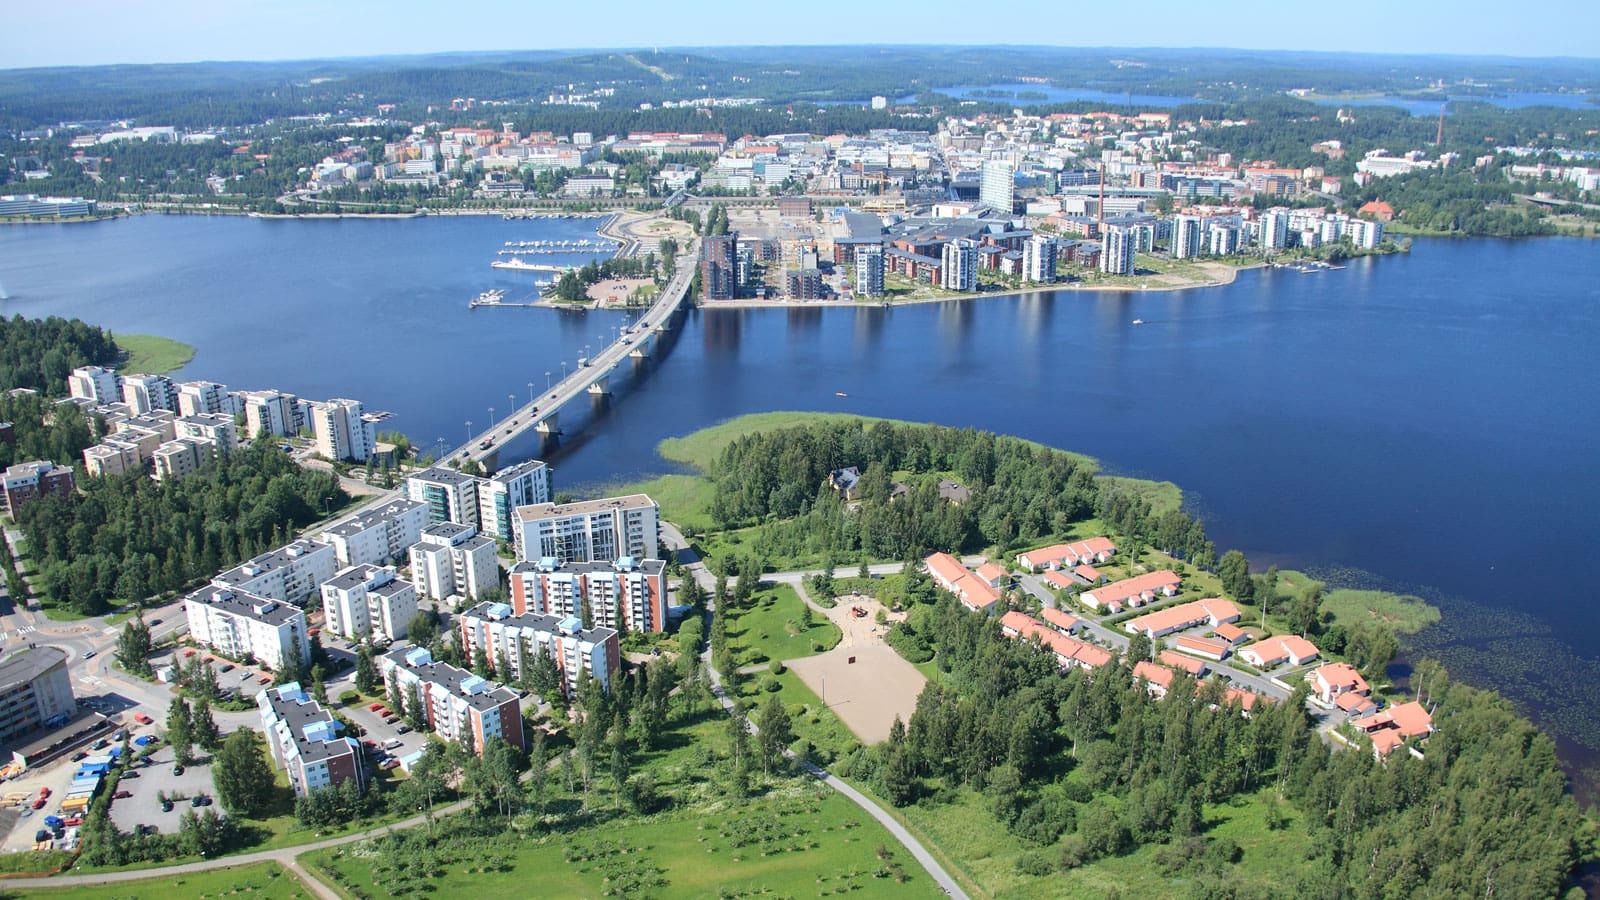 Aerial picture of Jyväskylä.